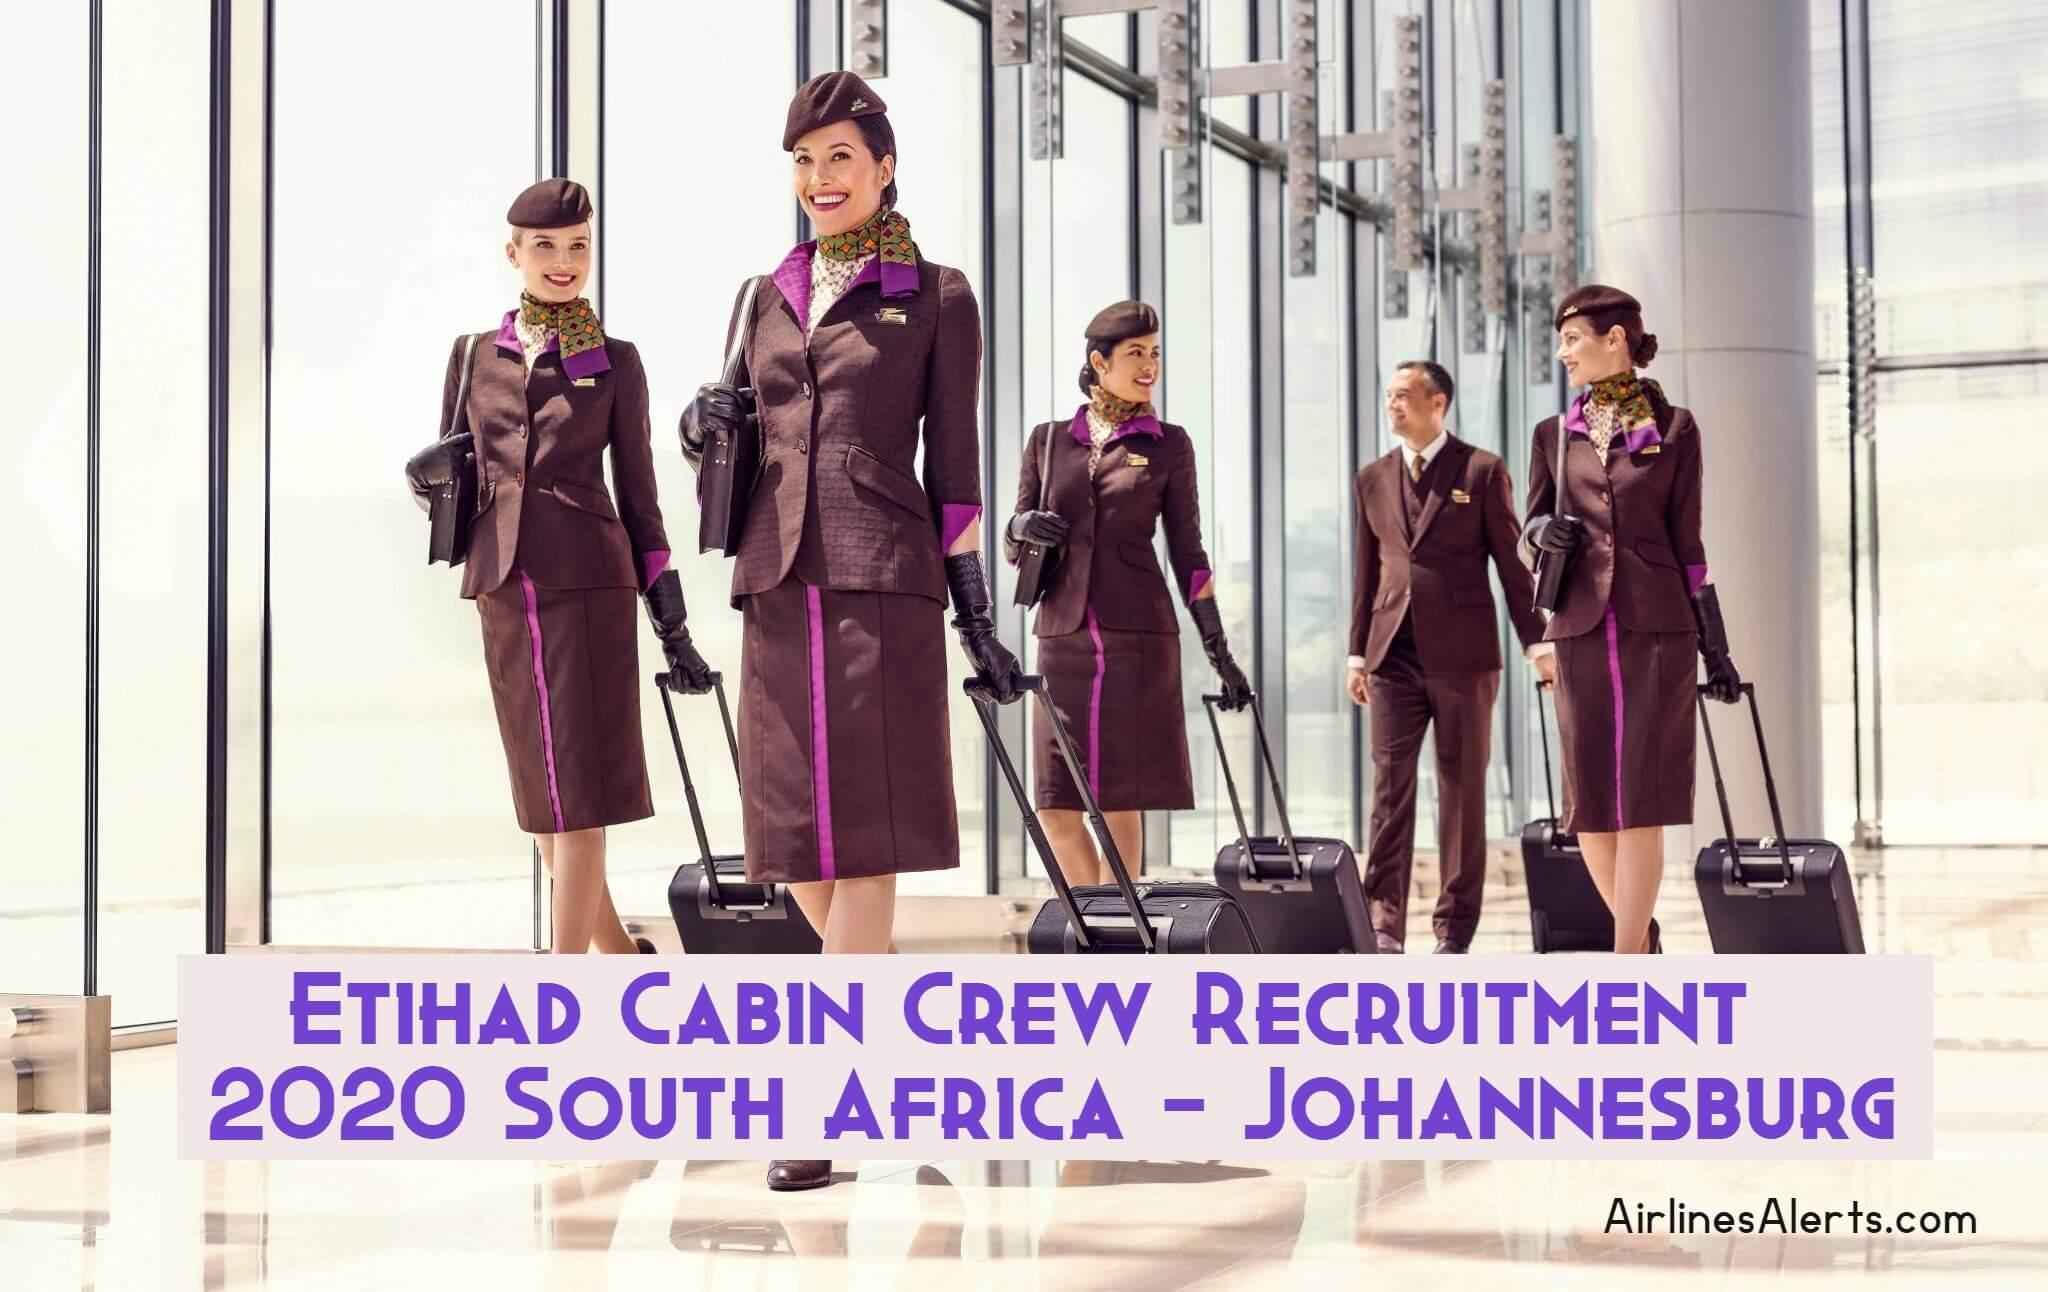 Etihad Cabin Crew Recruitment Johannesburg (SA) 2020